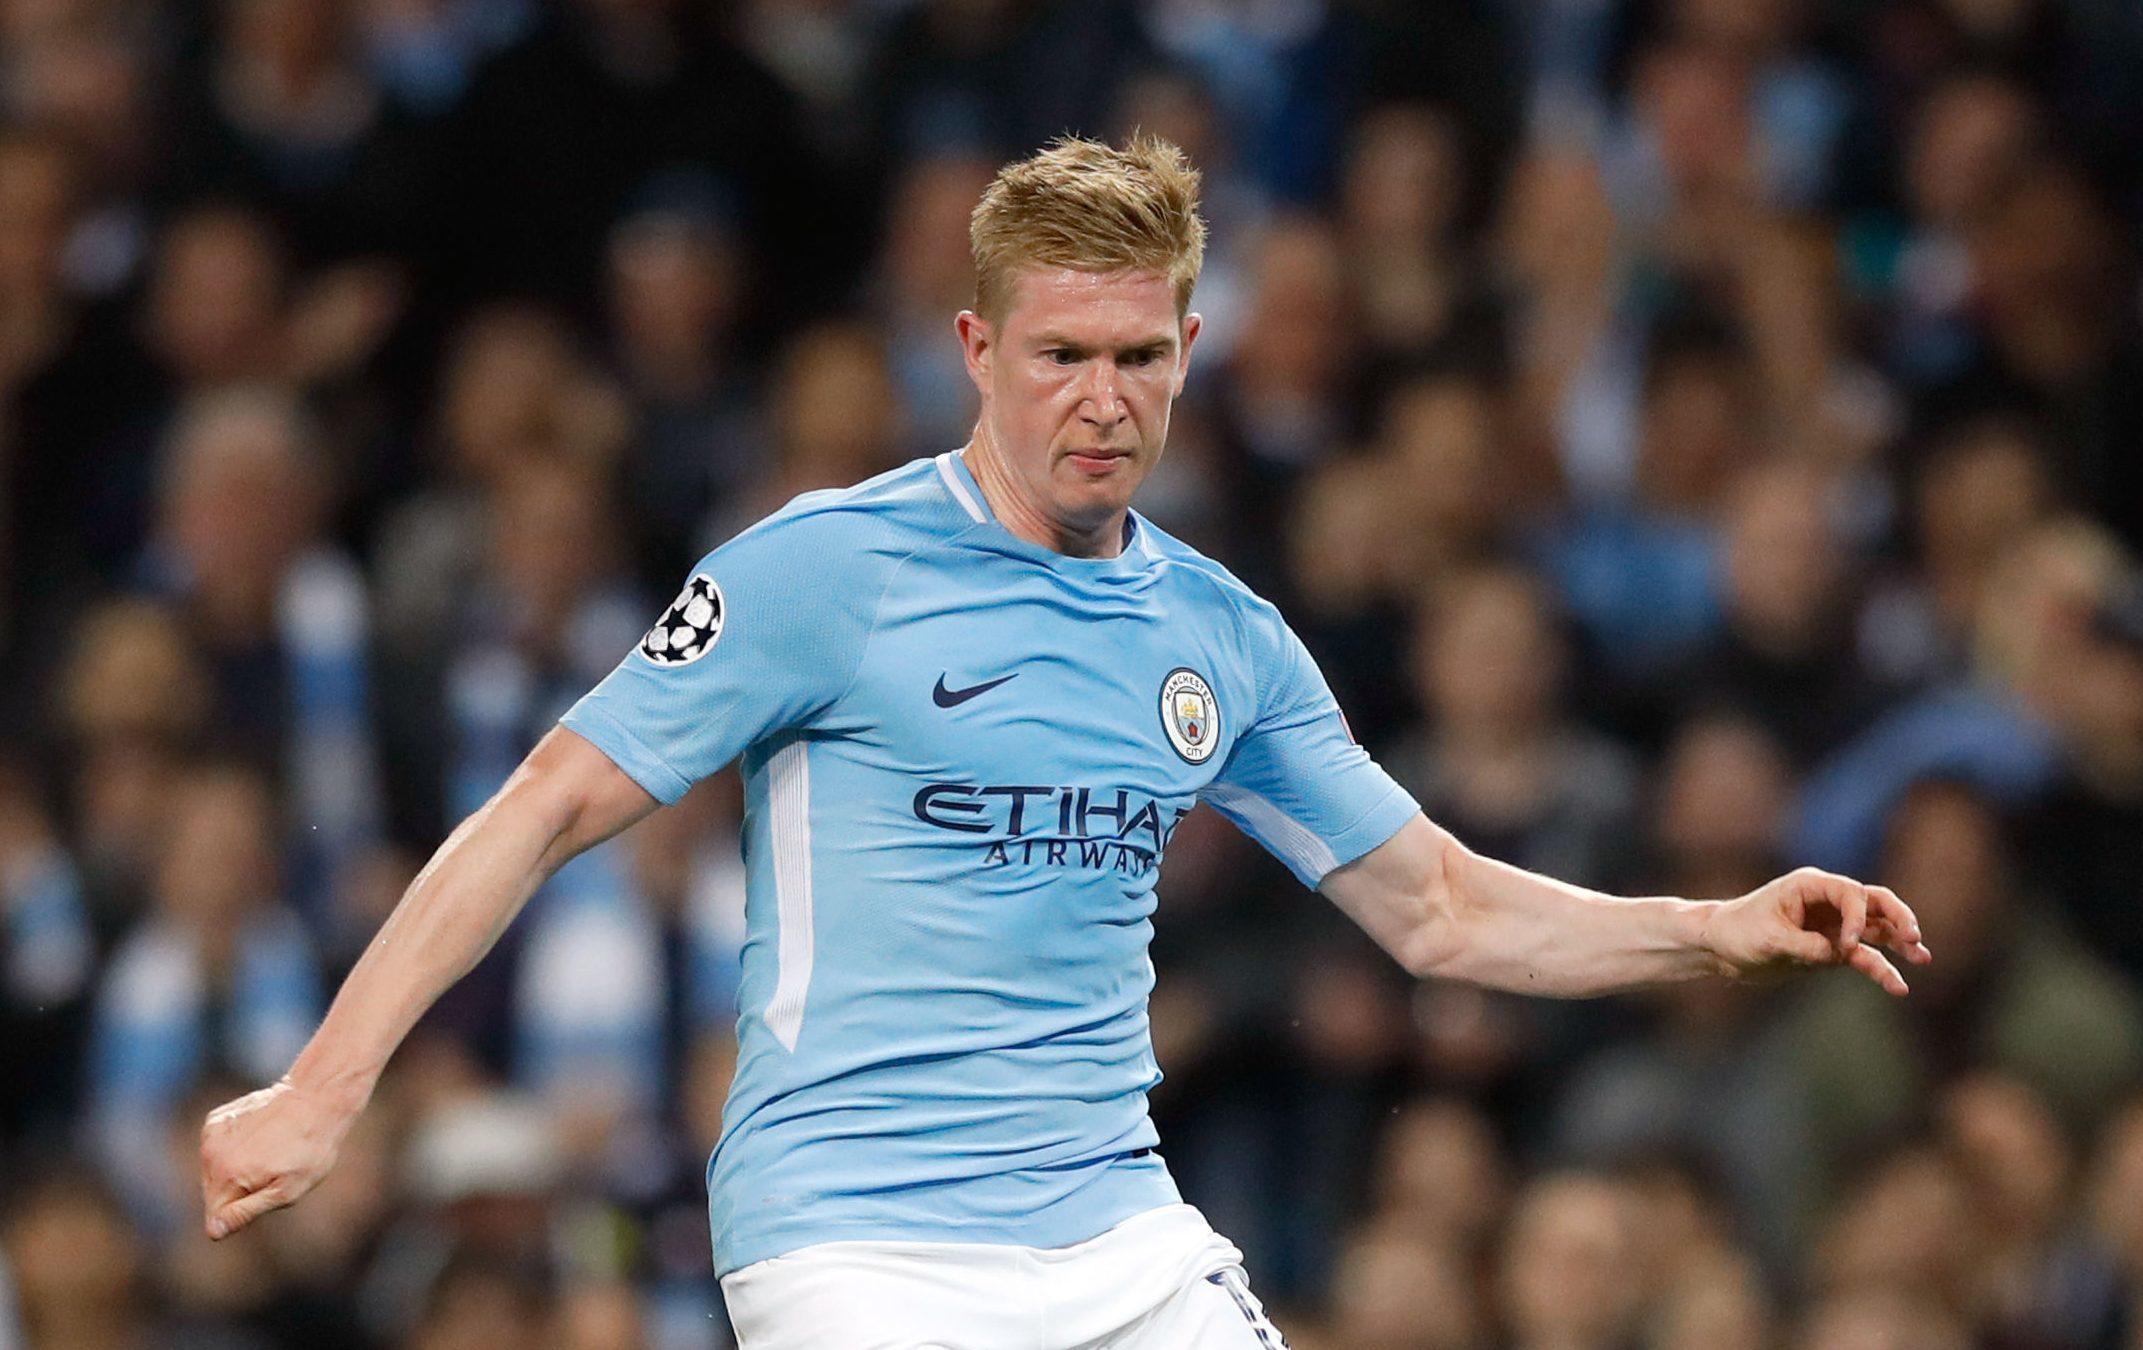 Manchester City's Kevin De Bruyne. (Martin Rickett/PA Wire)